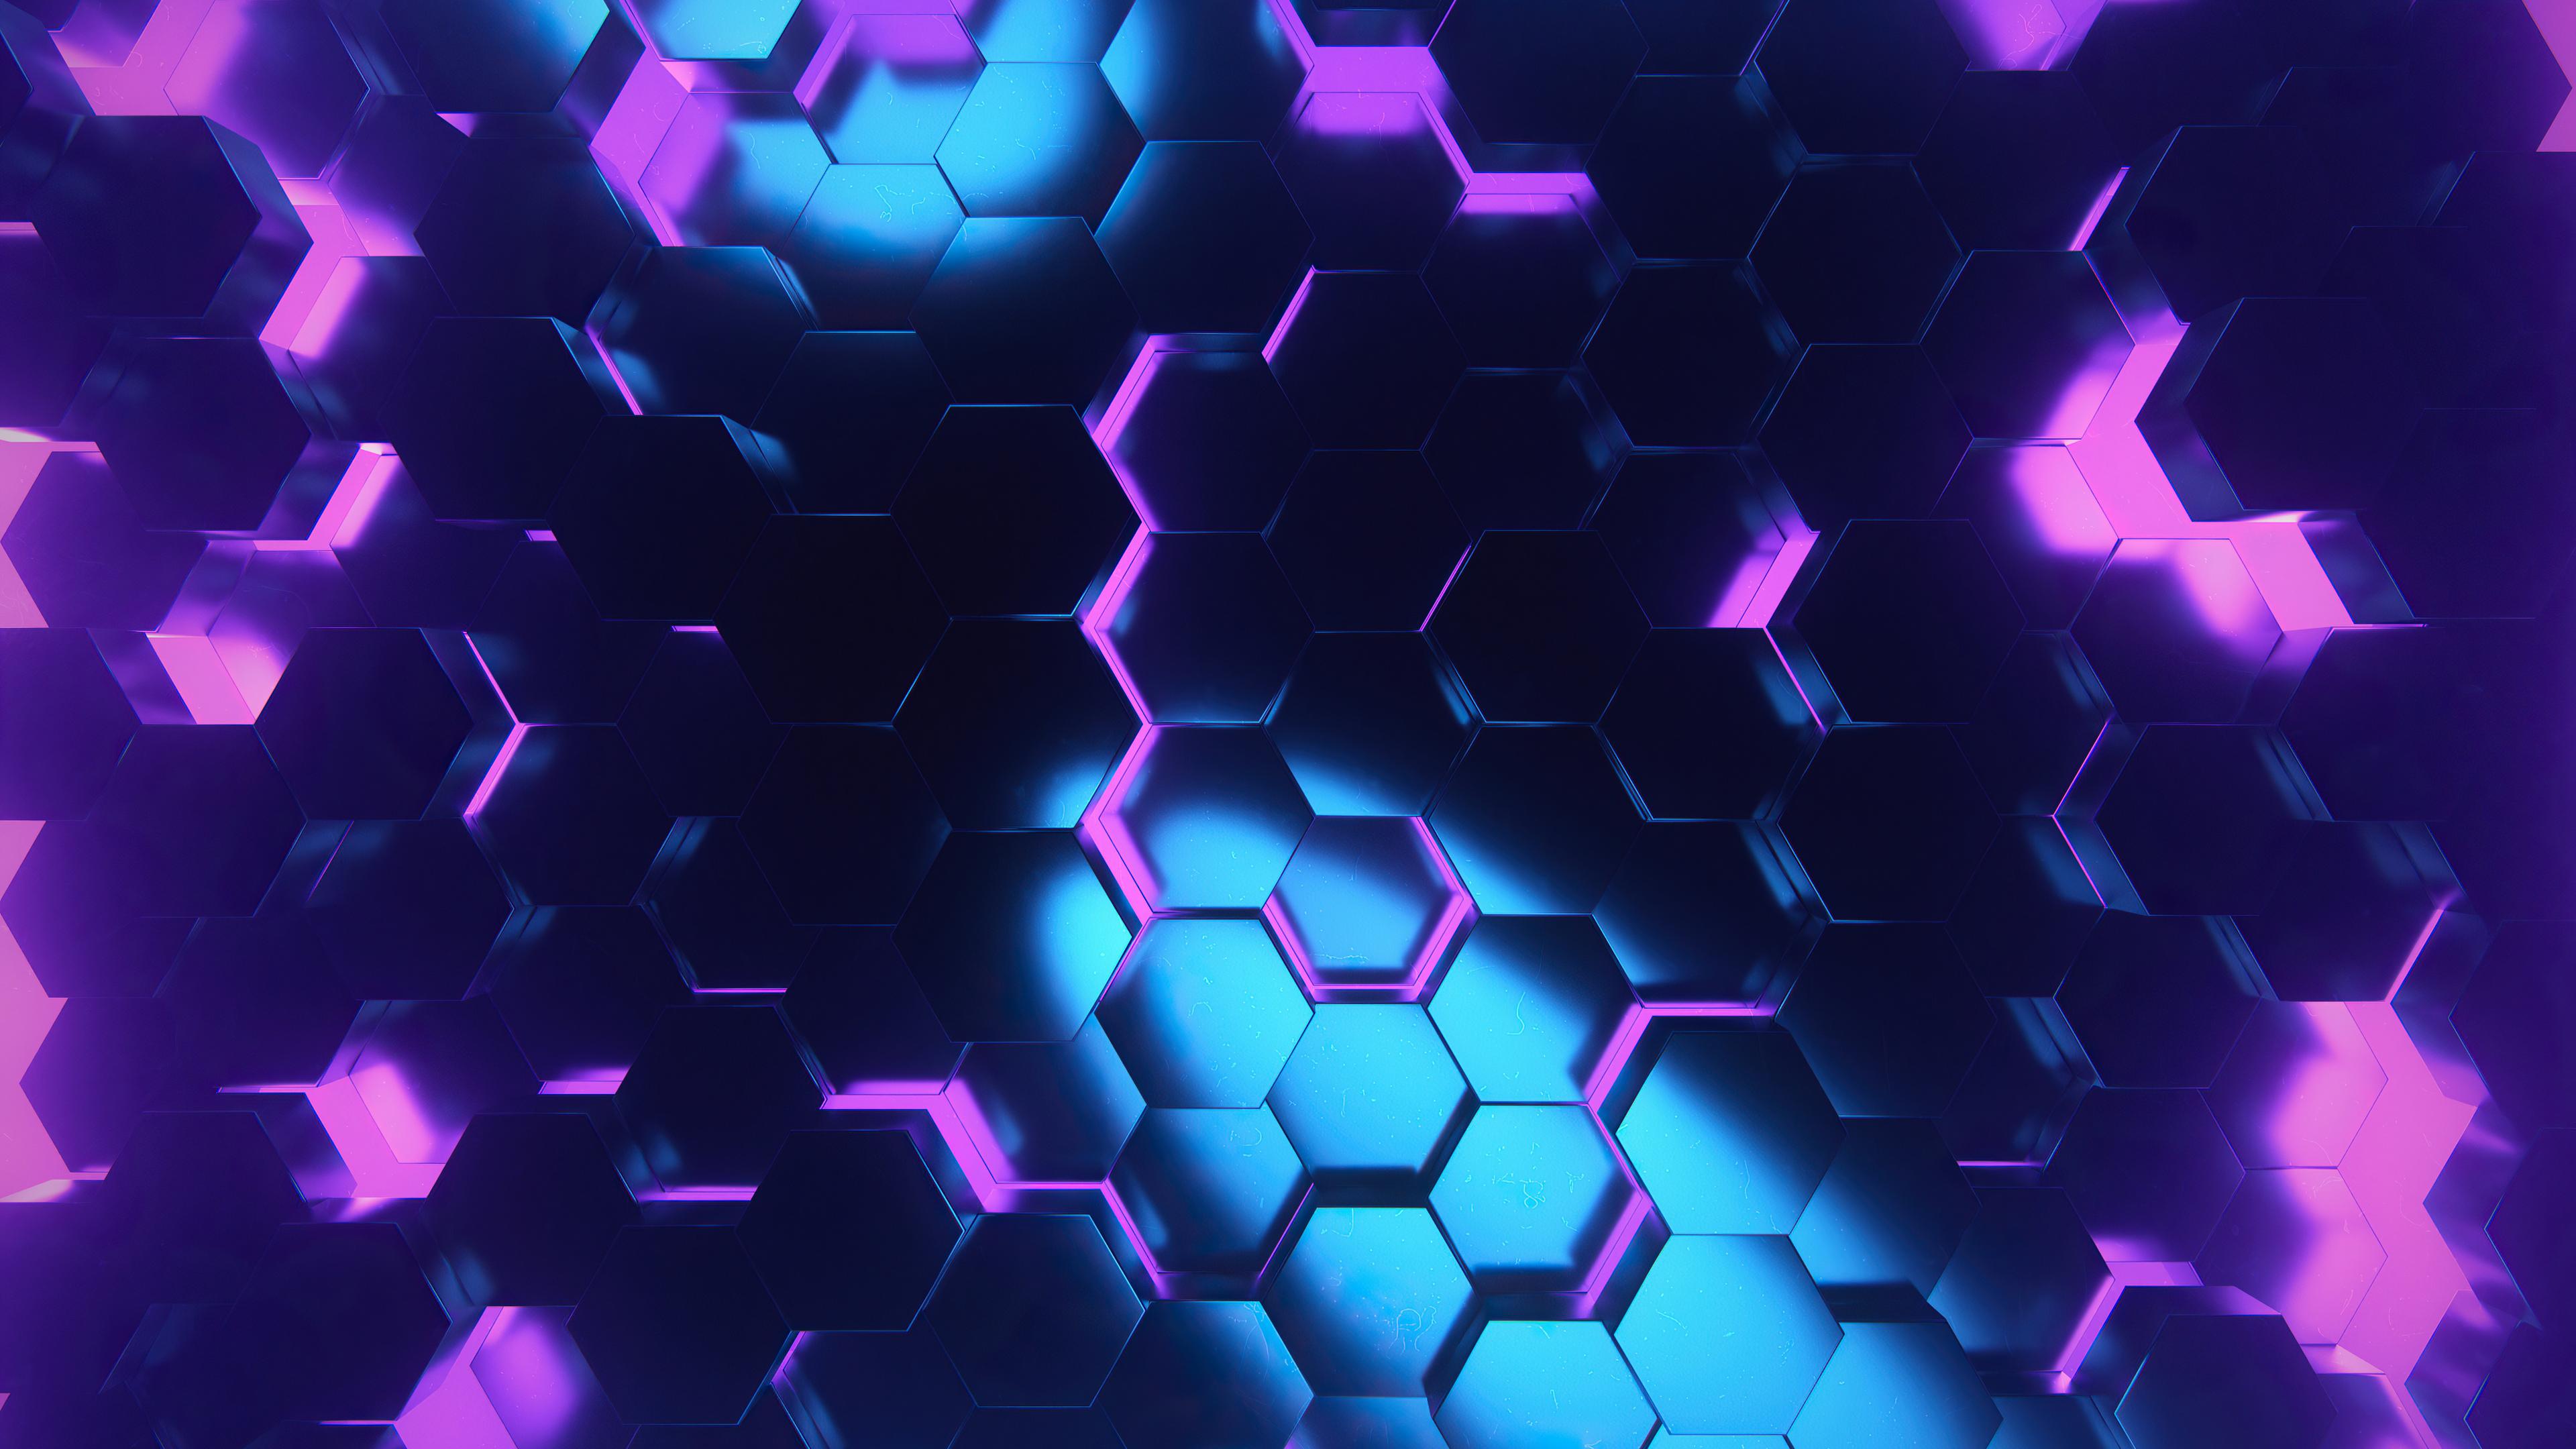 polygon shapes shining dark 4k 1602440131 - Polygon Shapes Shining Dark 4k - Polygon Shapes Shining Dark 4k wallpapers